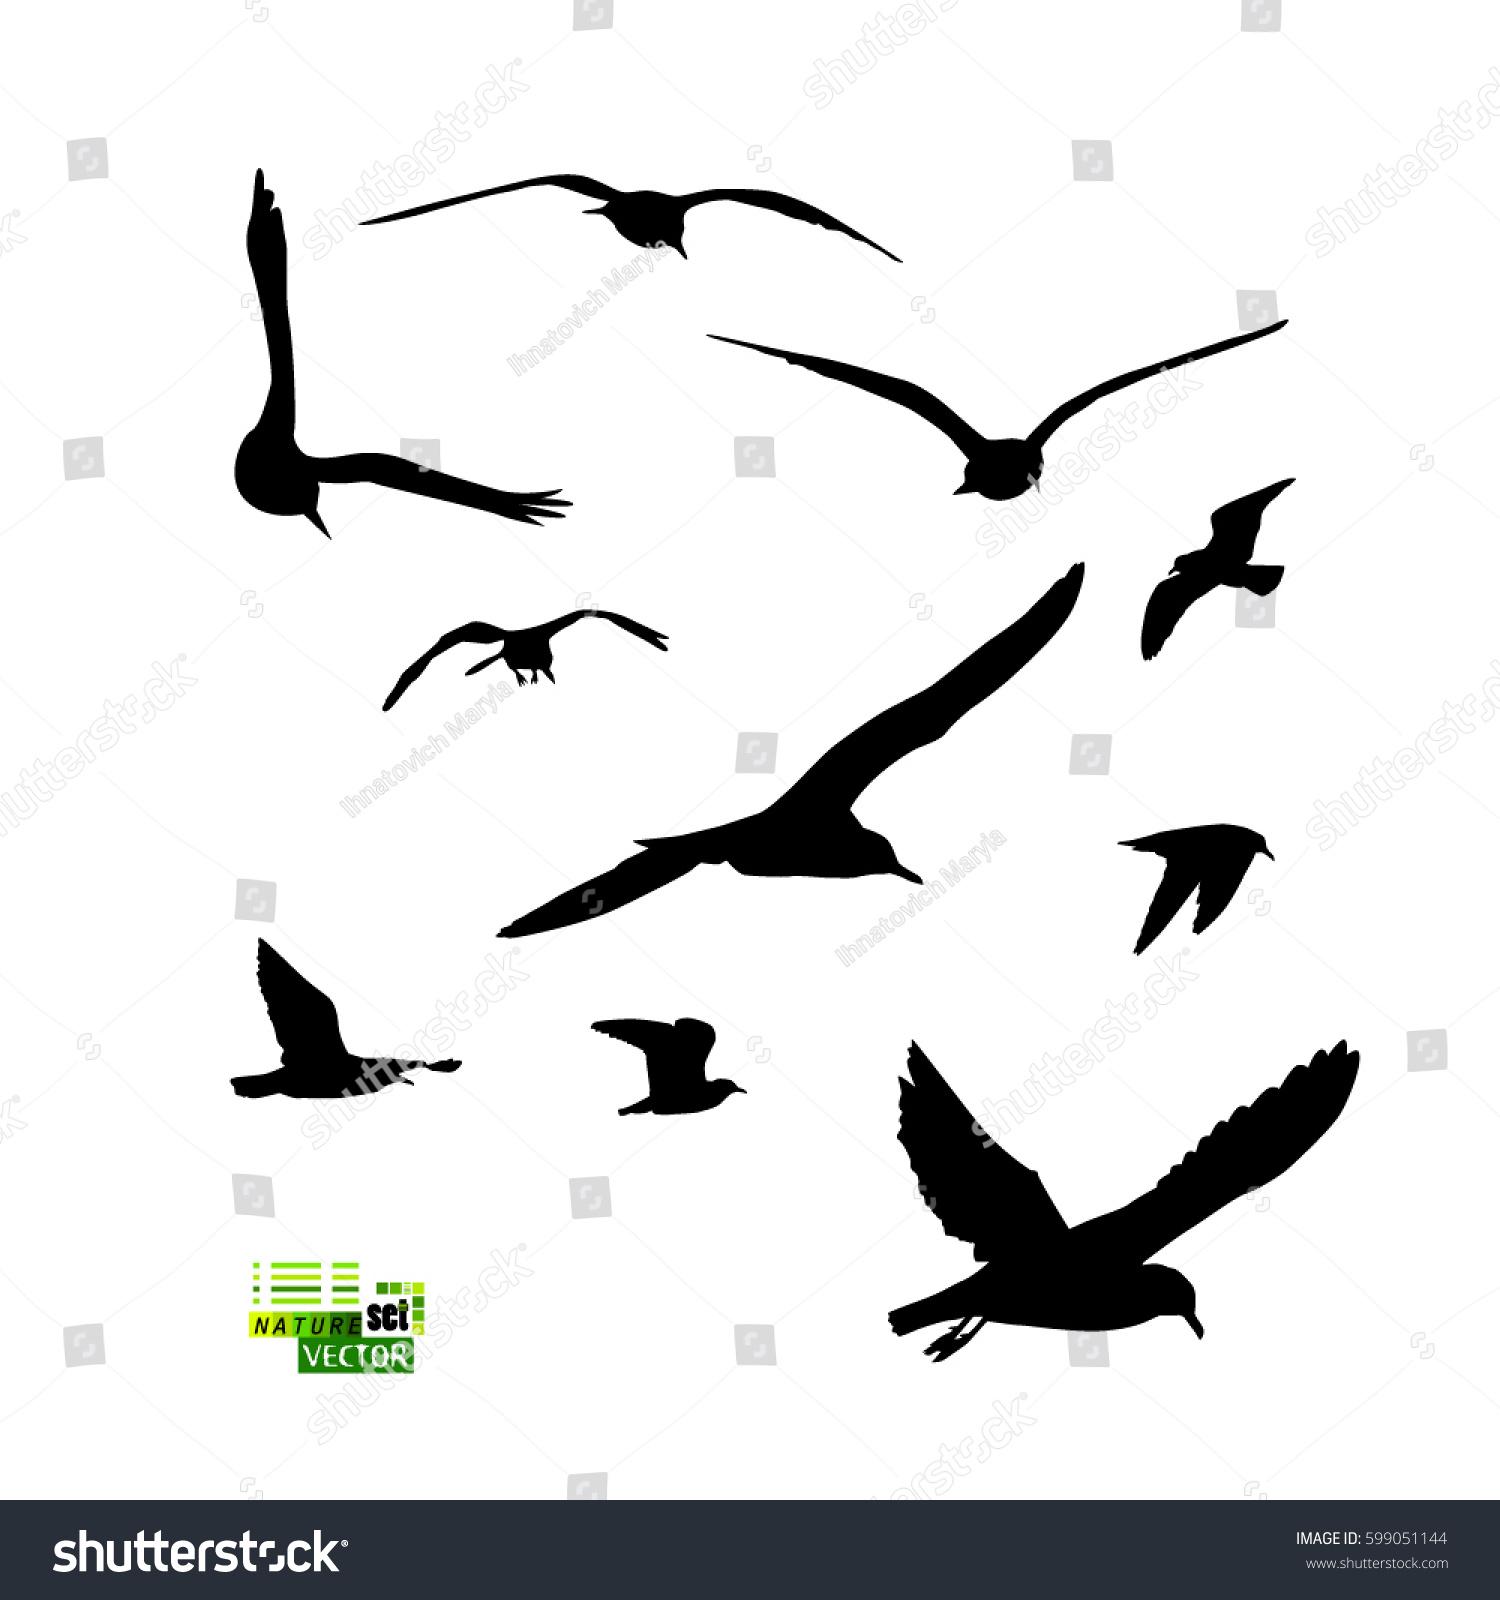 set flying seagull vector stock vector 2018 599051144 shutterstock rh shutterstock com seagull vector image seagull vector art free